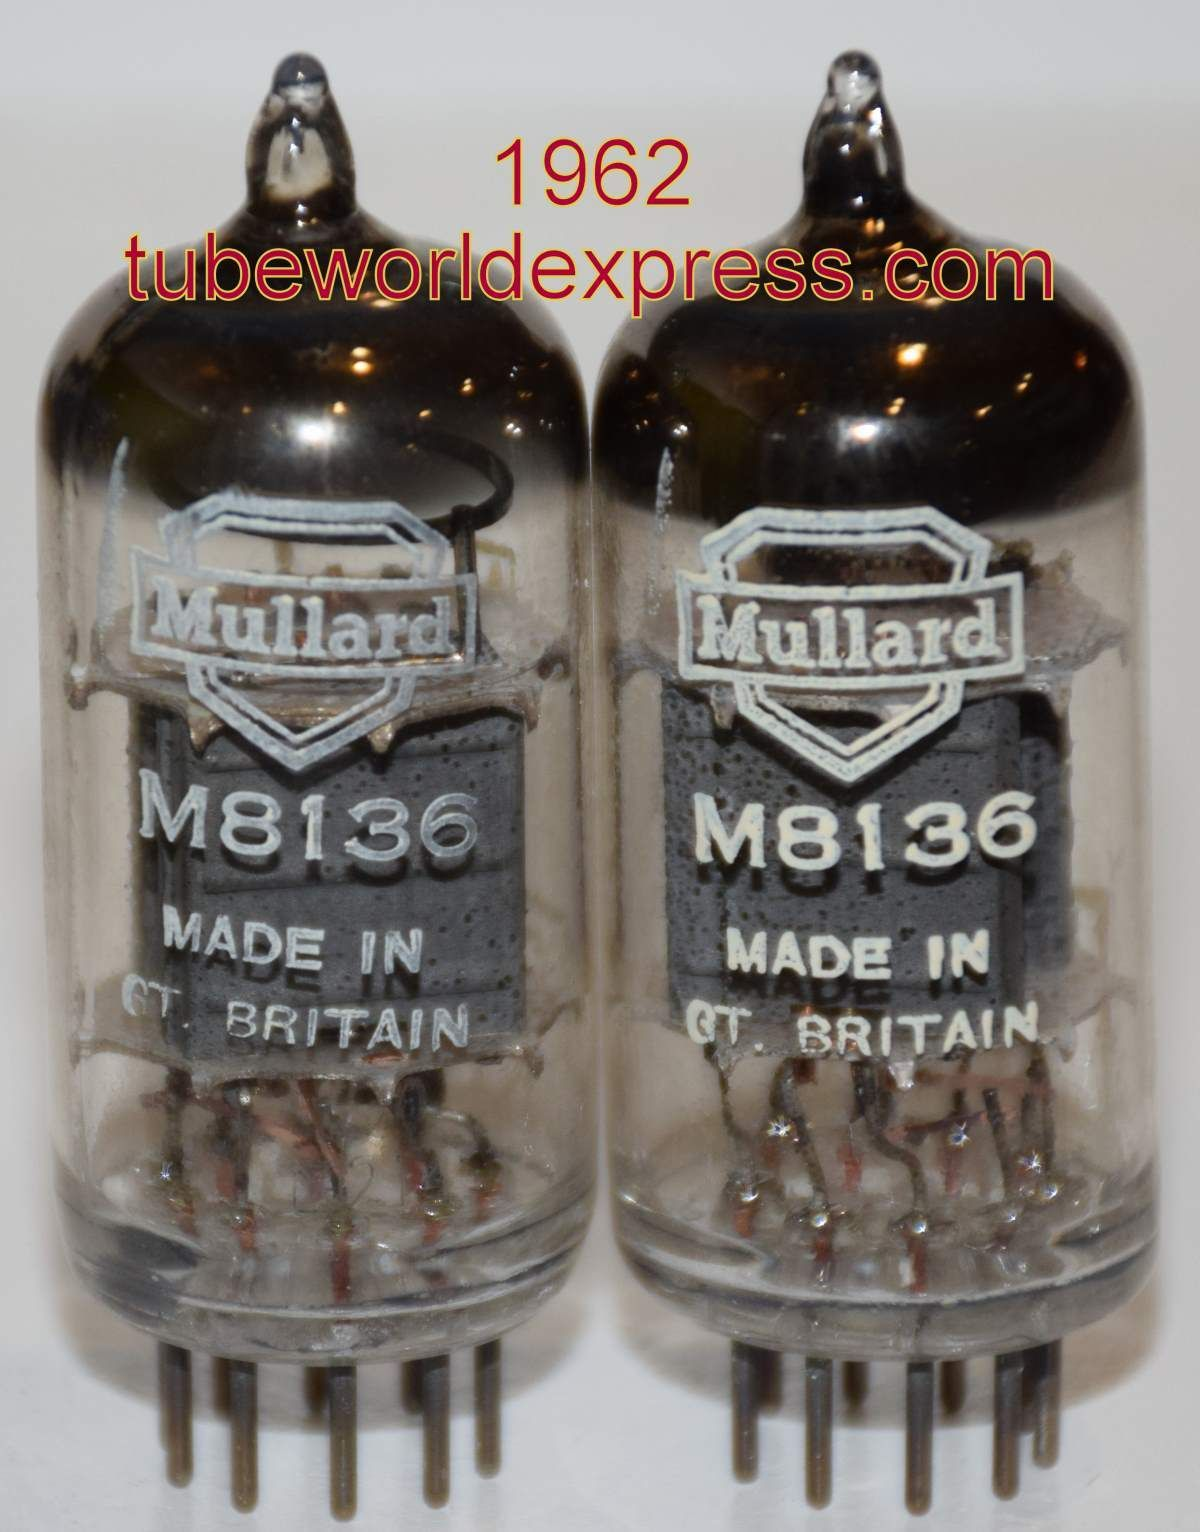 1 Cv4003 M8136 Pair Cv4003 M8136 12au7 Mullard Whyteleafe Pl Vintage Valve Plants Uk Tube